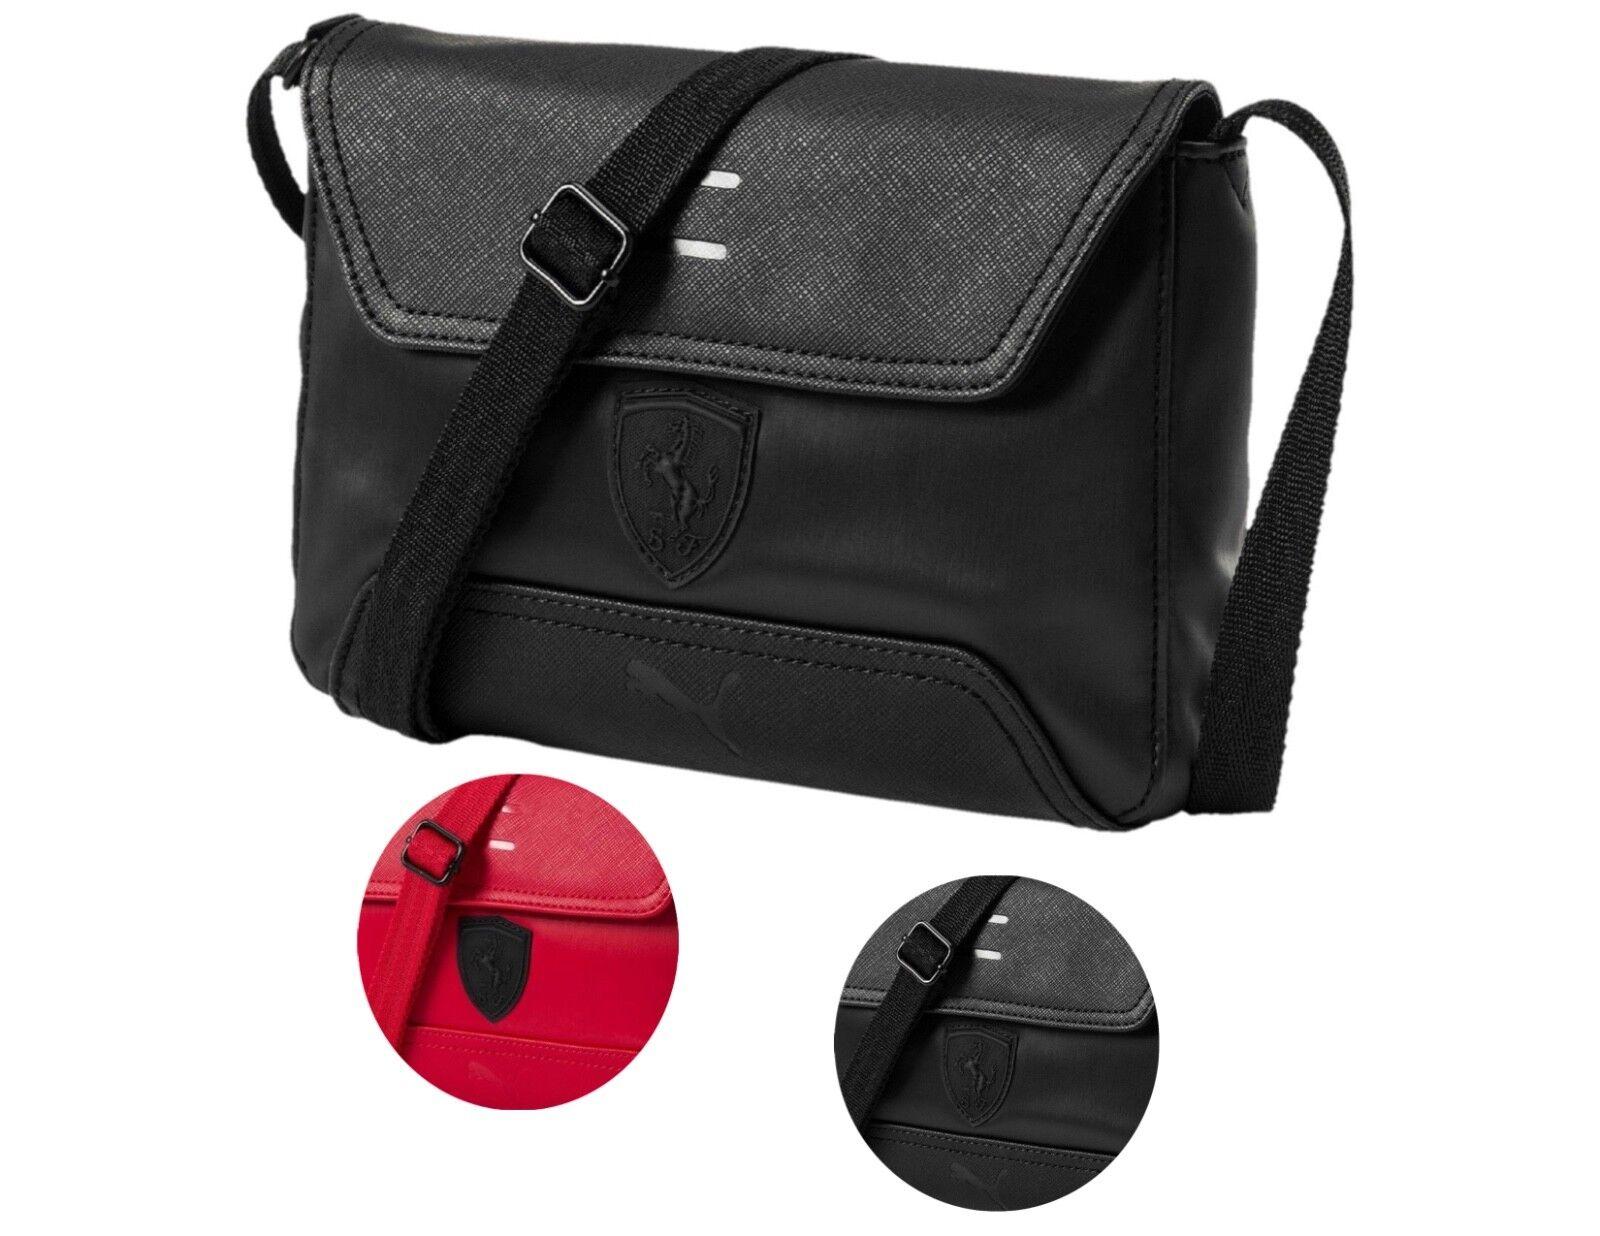 ba2fa8b4c PUMA Scuderia Ferrari LS Women Red Handbag Small Satchel 074845 for sale  online | eBay